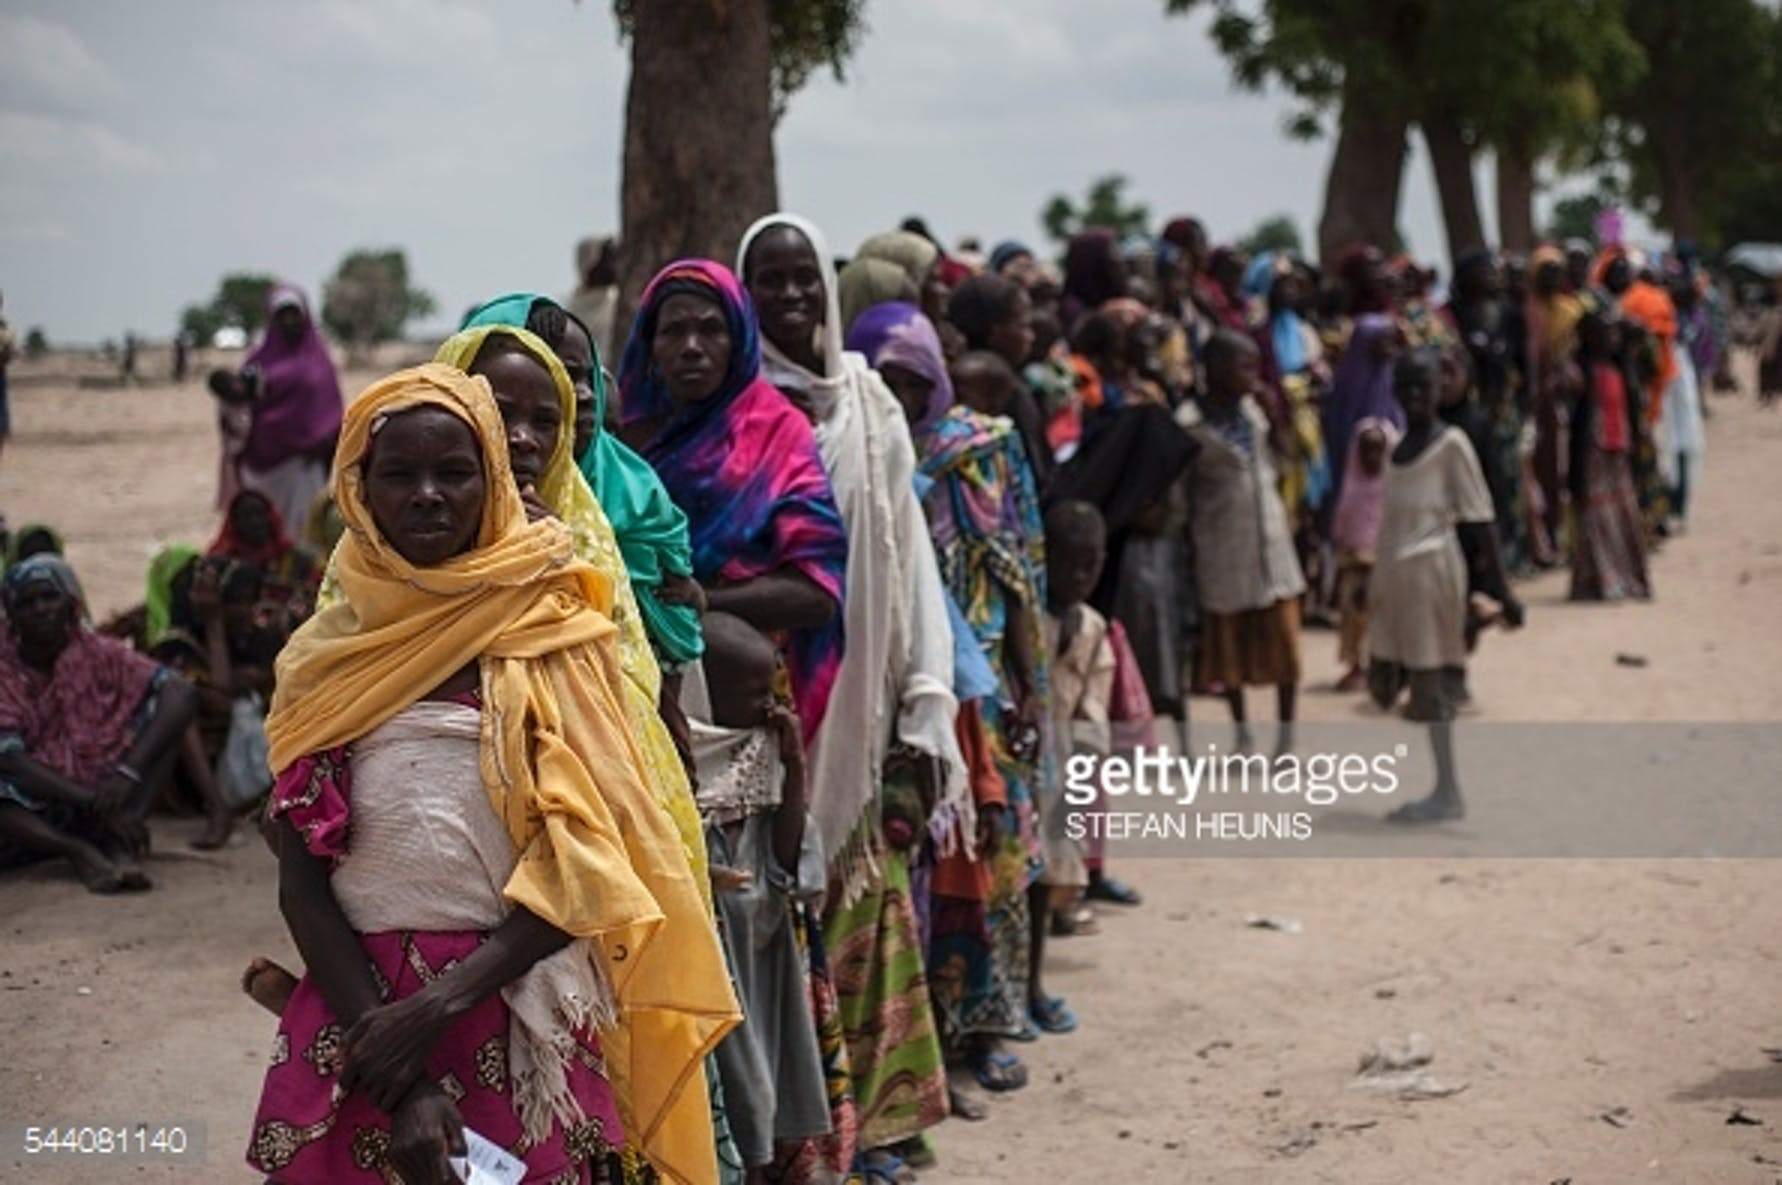 STEFAN HEUNIS/AFP/Getty Images